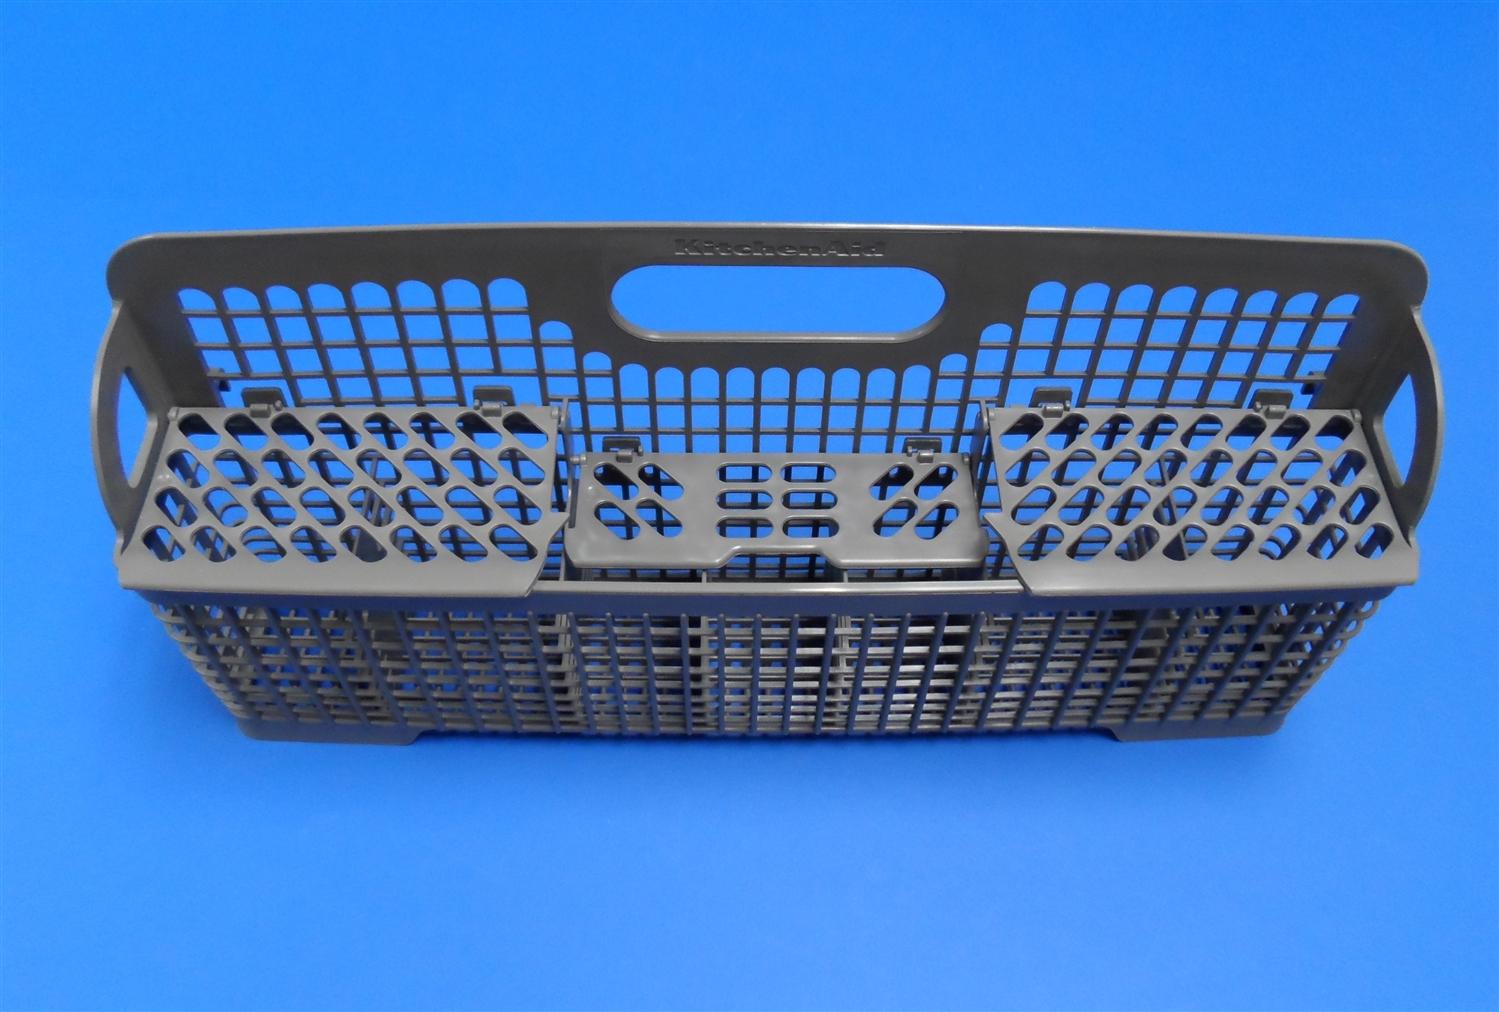 KitchenAid WPW10190415 Dishwasher Silverware Basket on